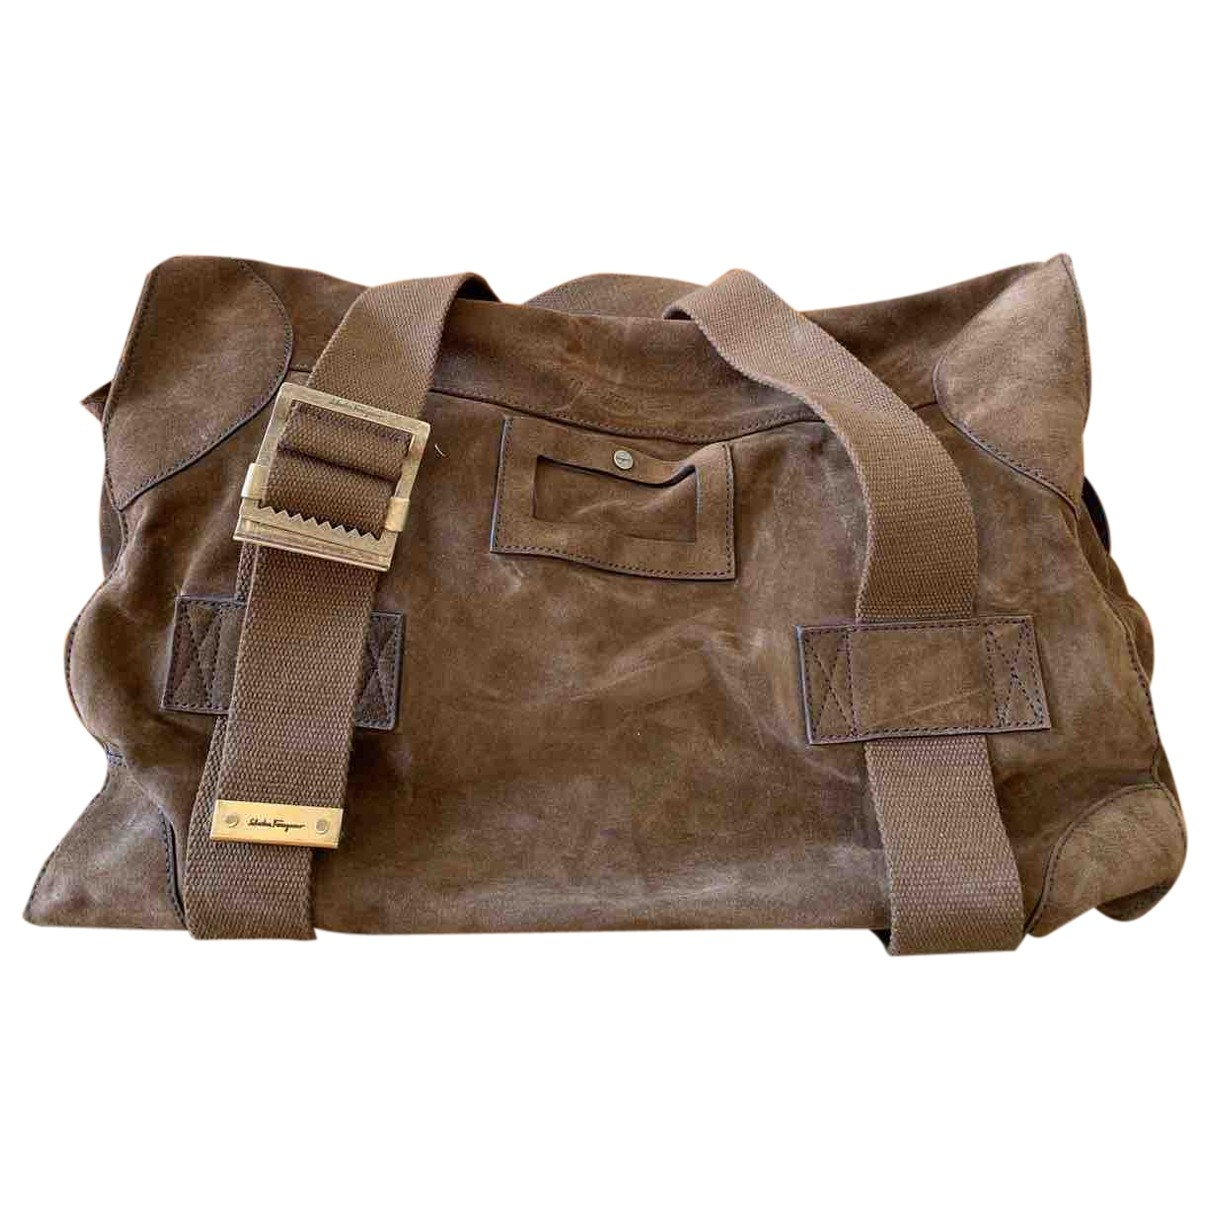 Salvatore Ferragamo \N Brown Suede bag for Men \N